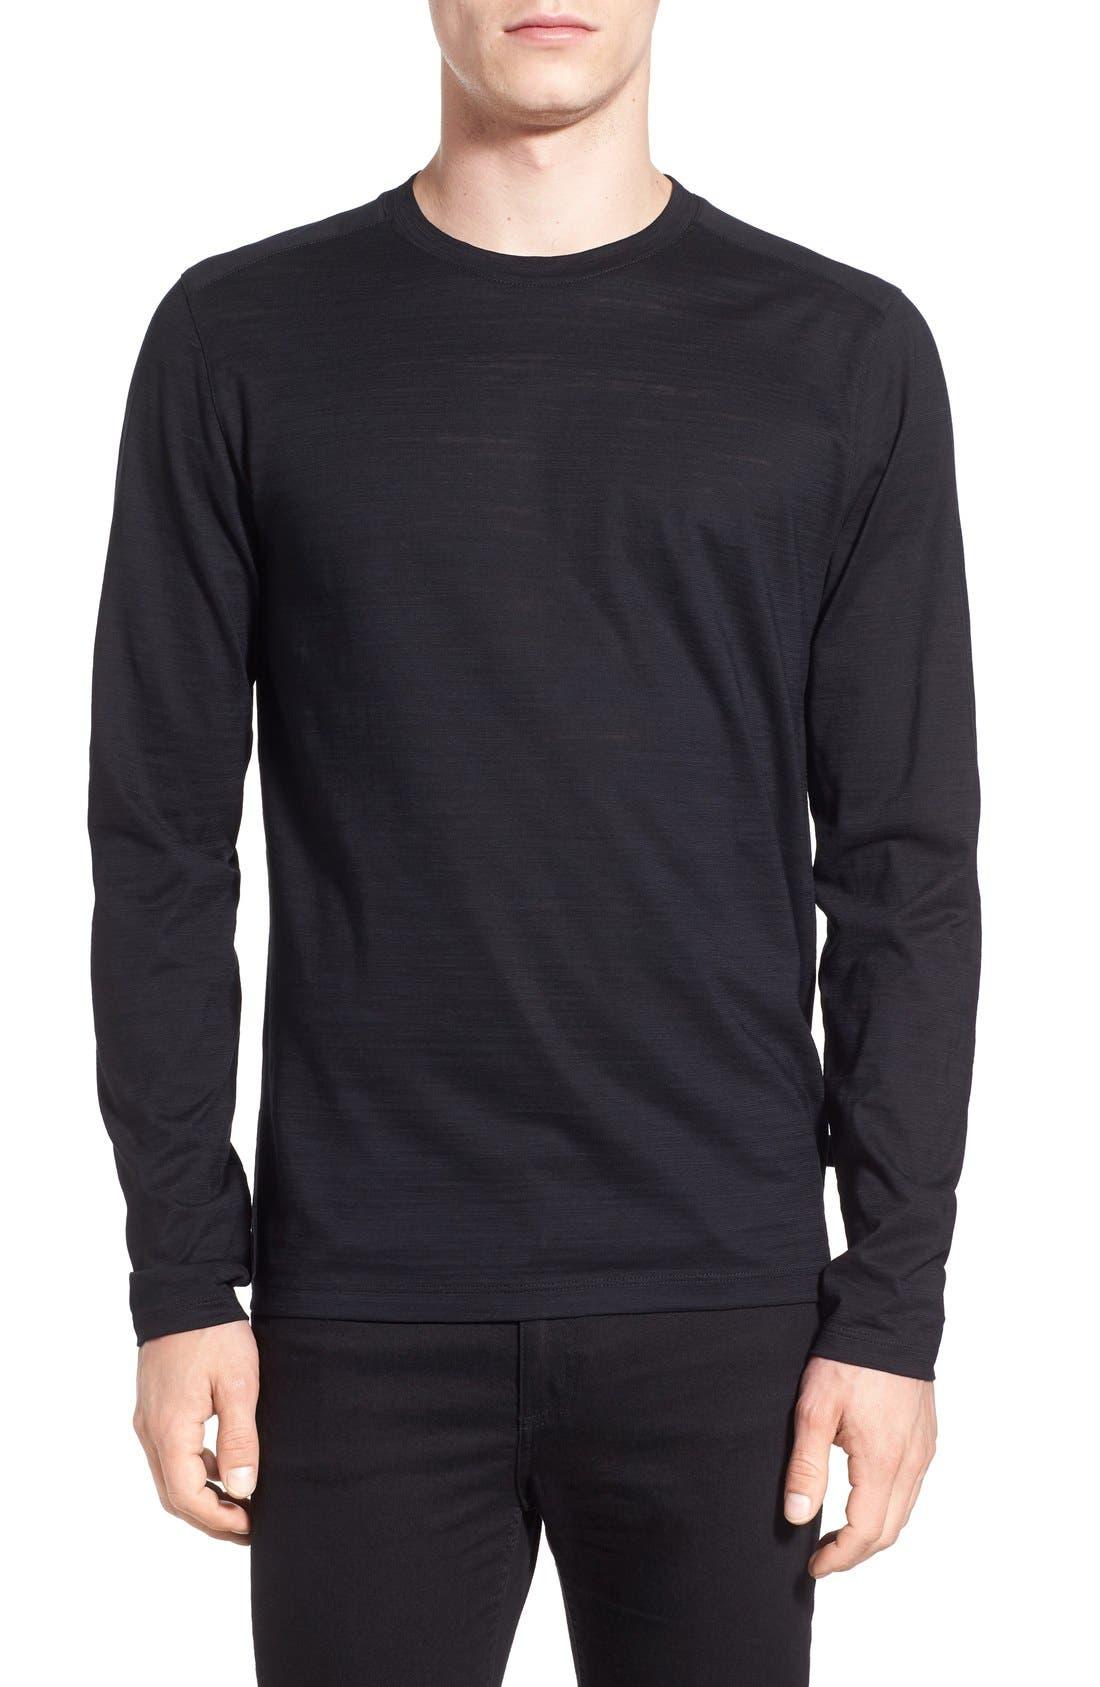 'Tenison' Slim Fit Long Sleeve T-Shirt,                             Main thumbnail 1, color,                             001